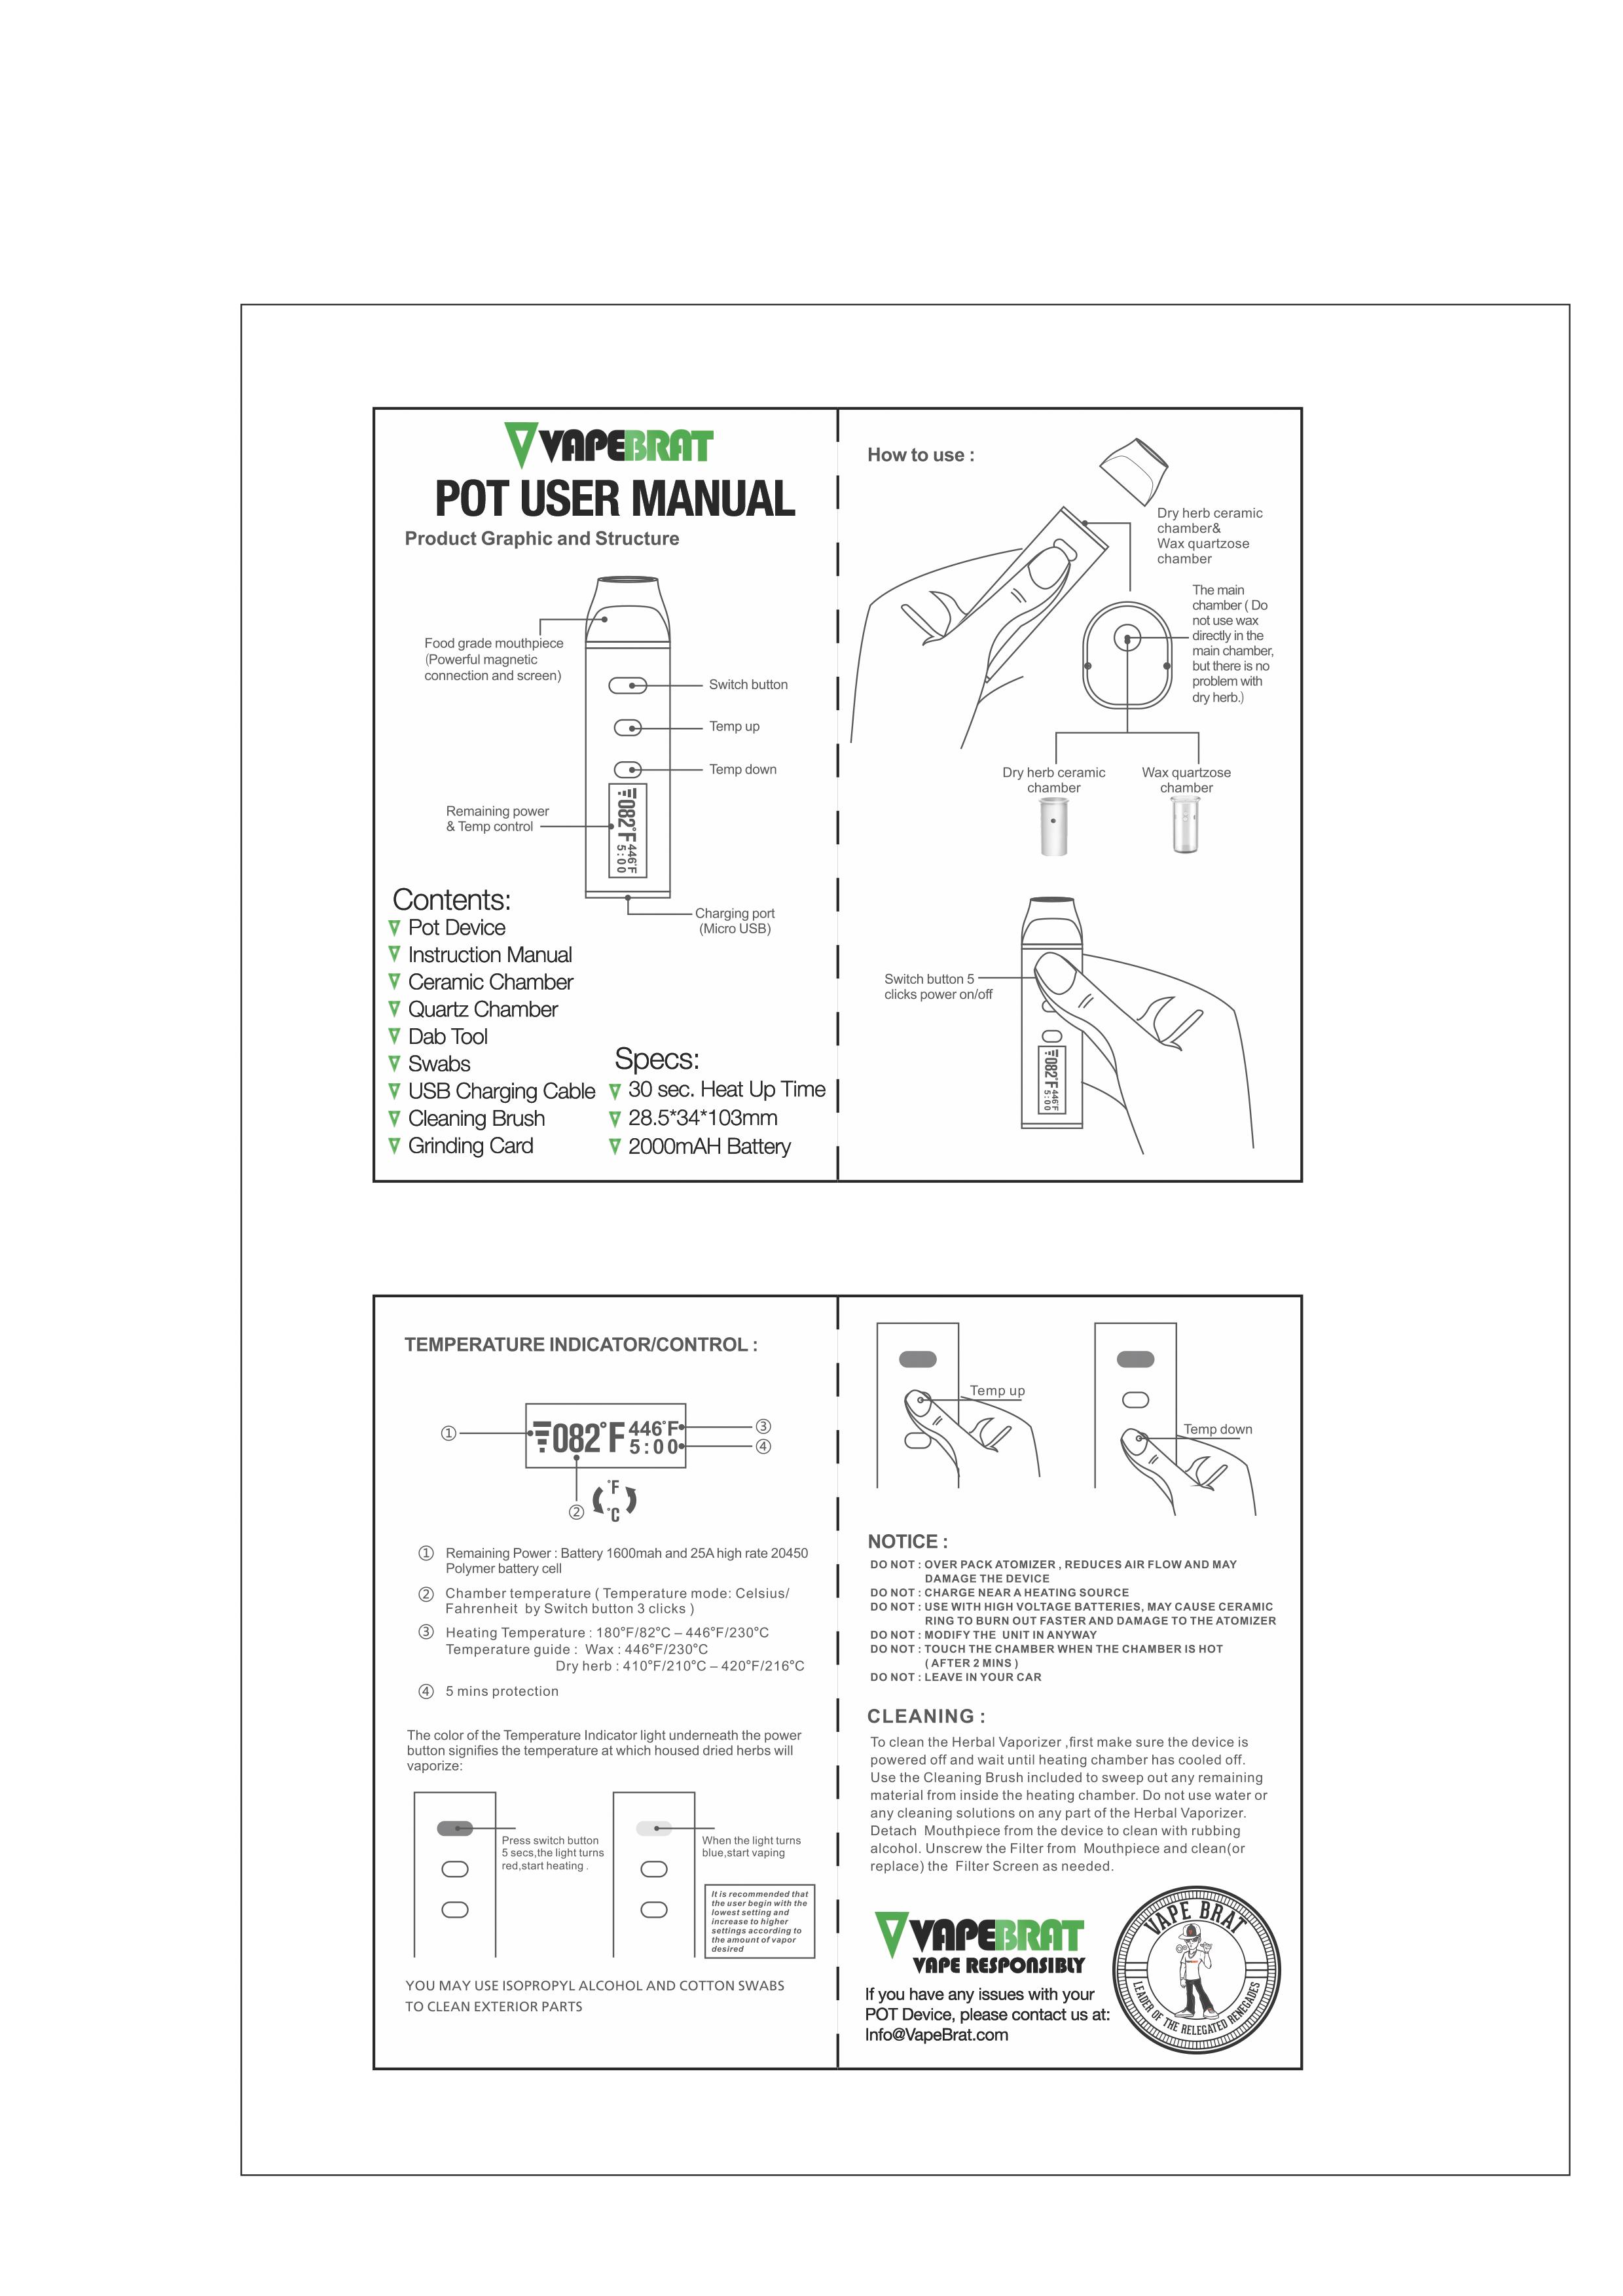 pot-user-manual-2.jpg